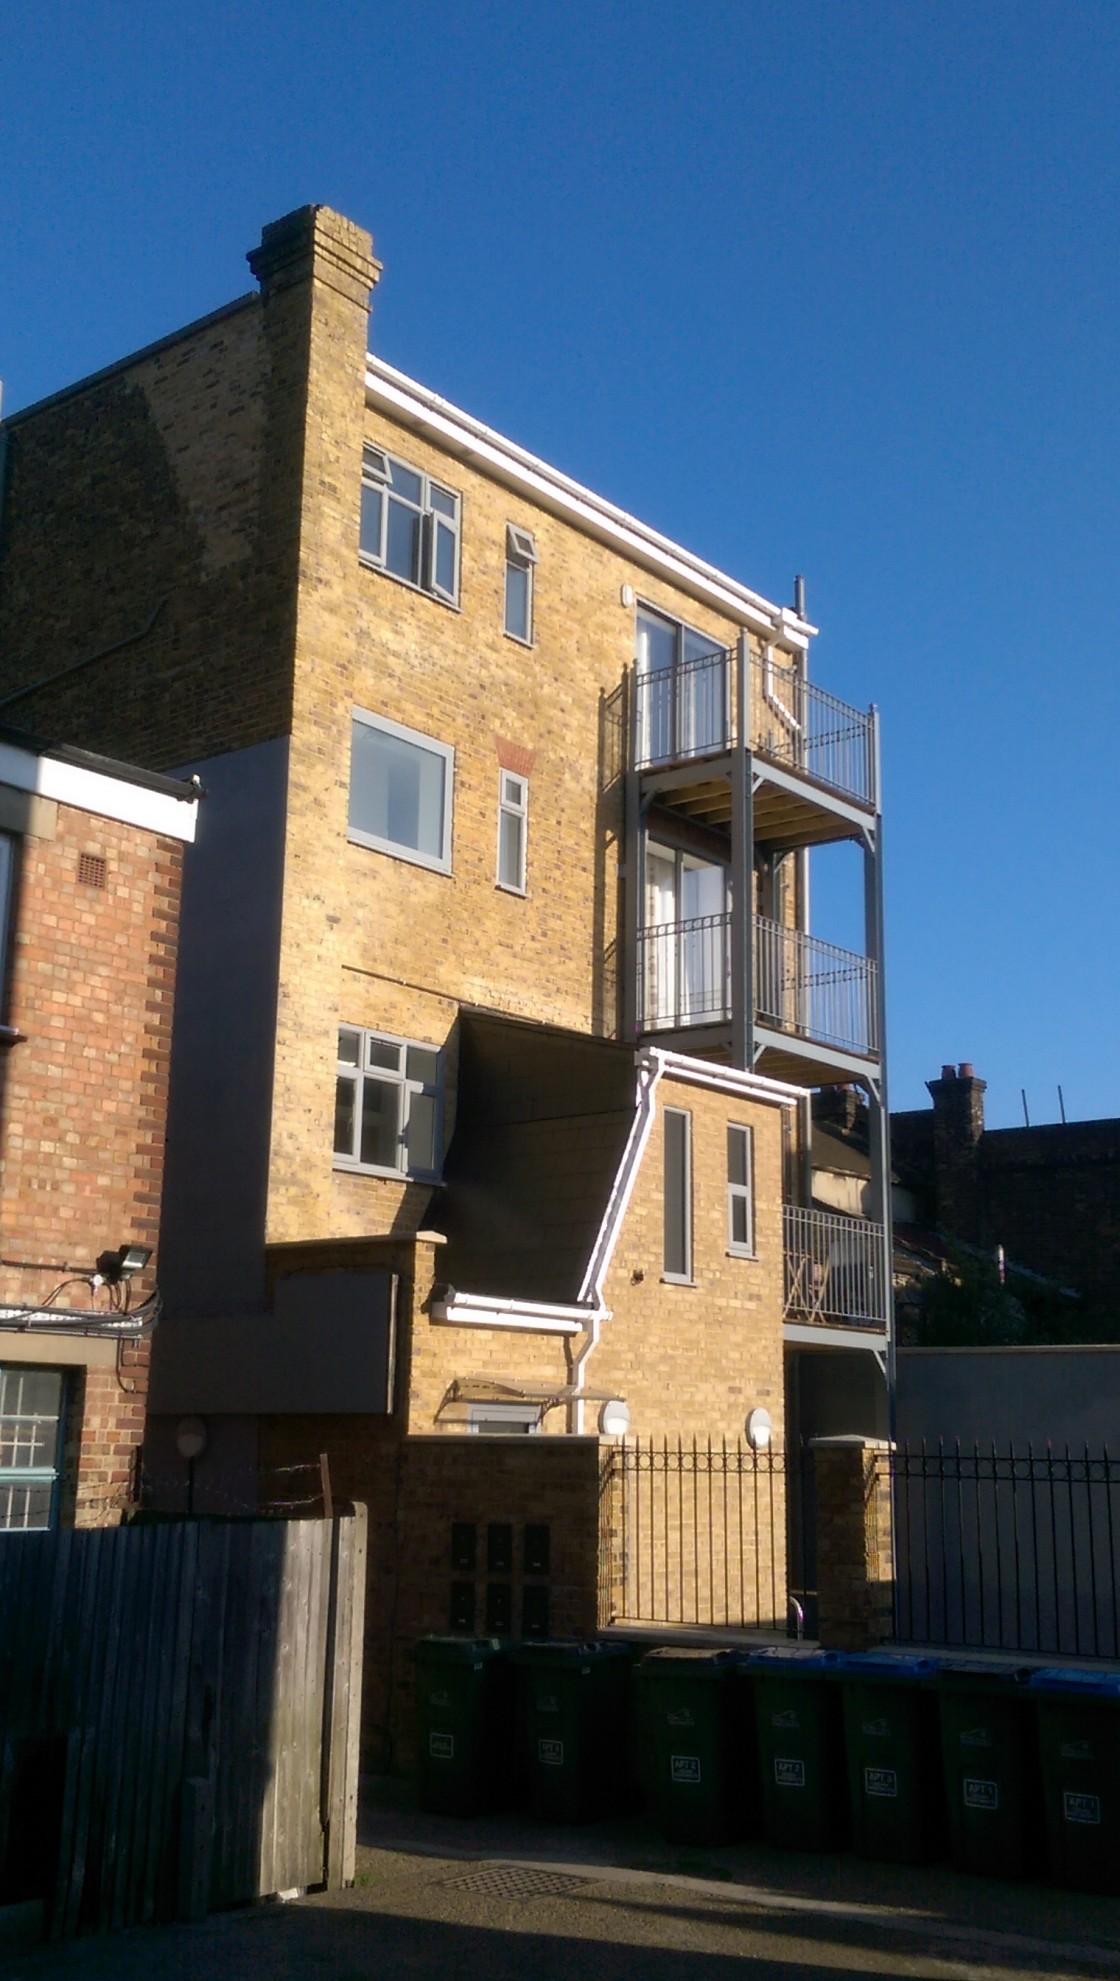 11 Court Yard, Eltham, London, SE95QE (Greenwich Council) (planning permission & building control)